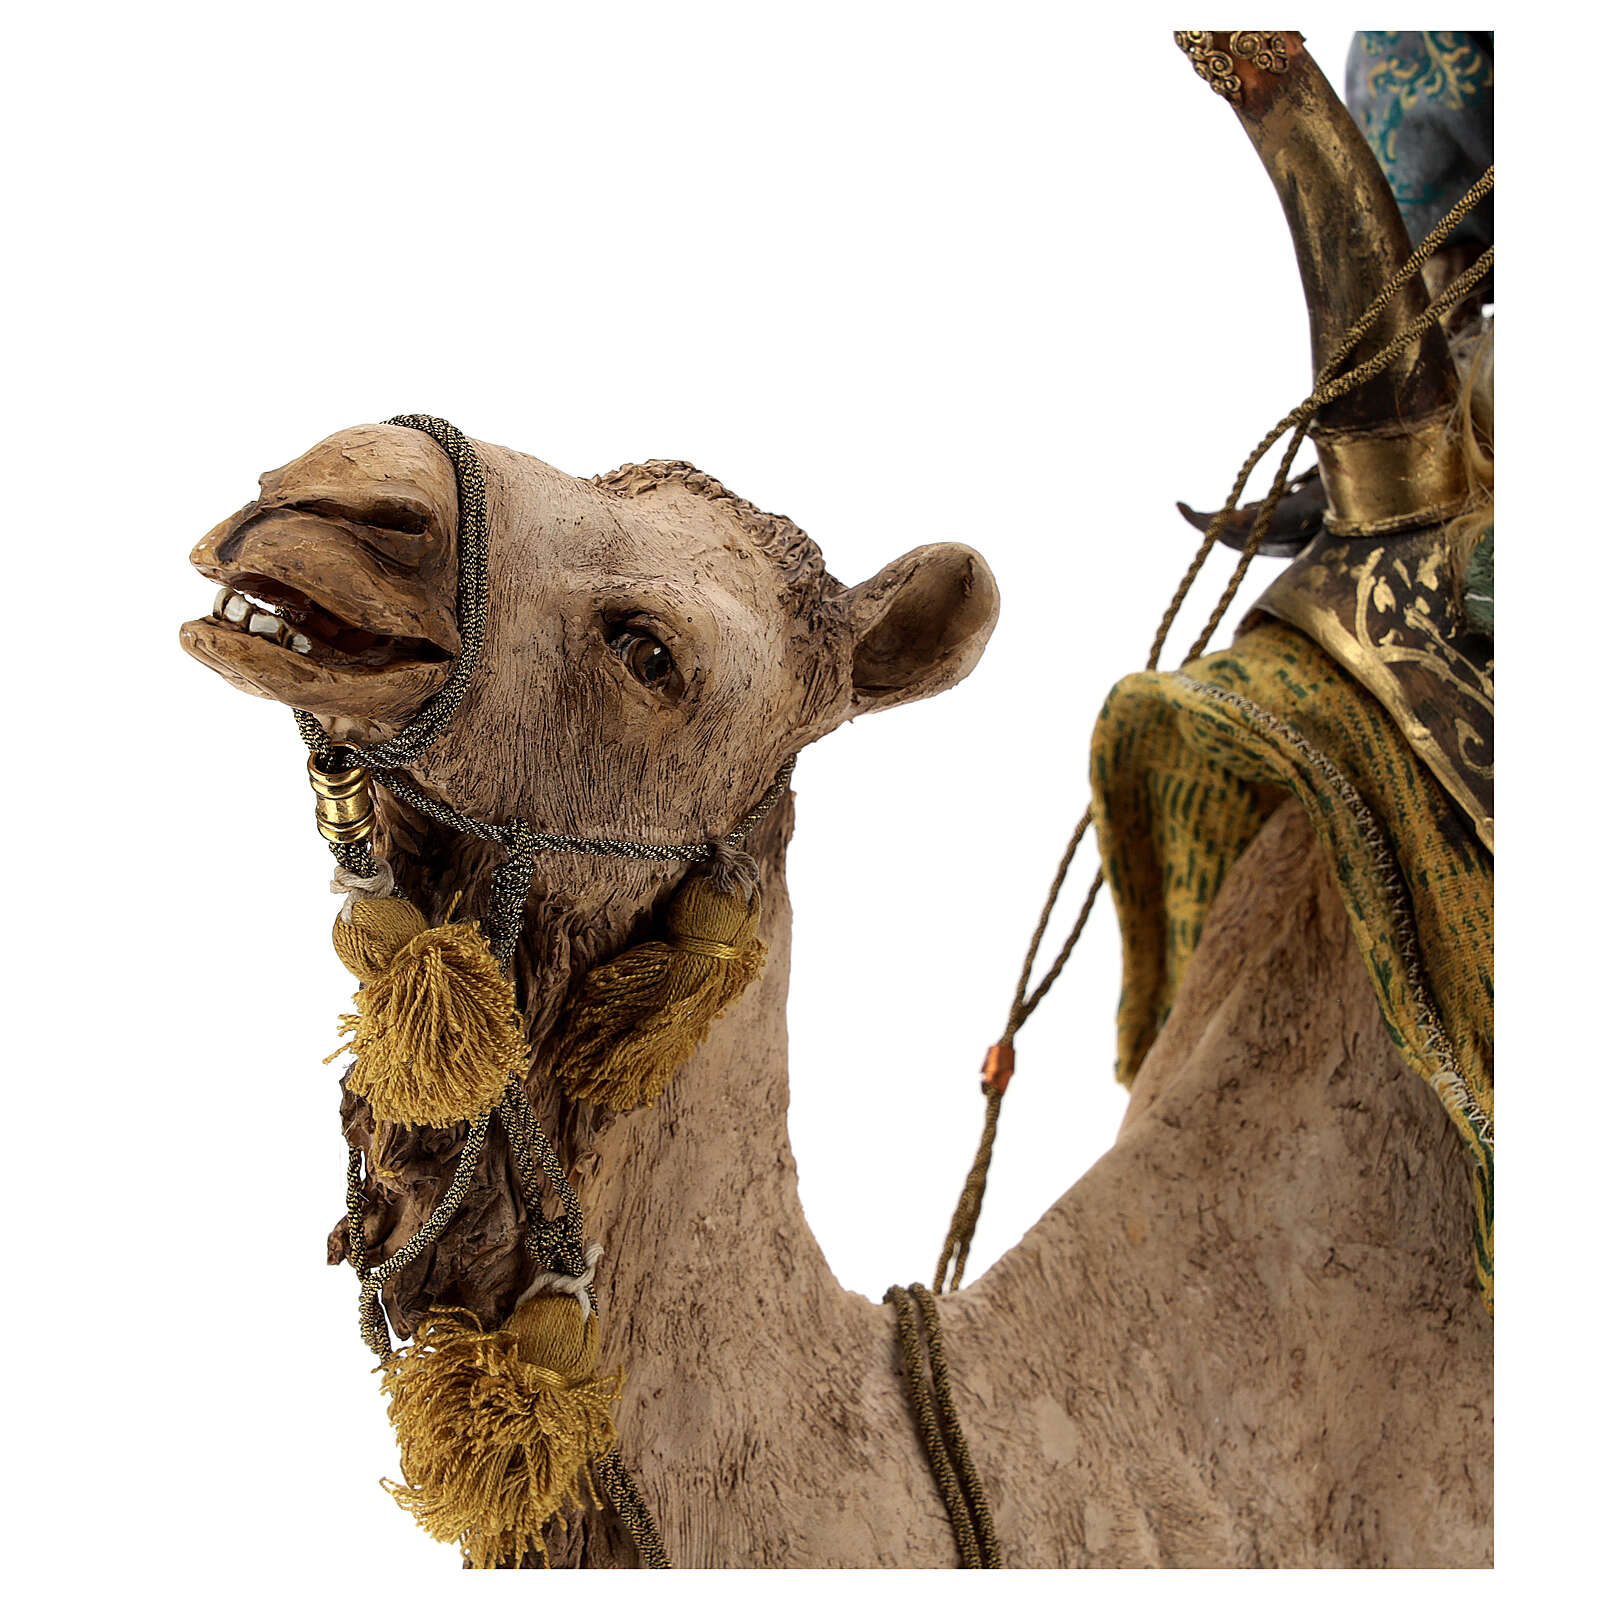 Magi on camel, Angela Tripi 30 cm 4